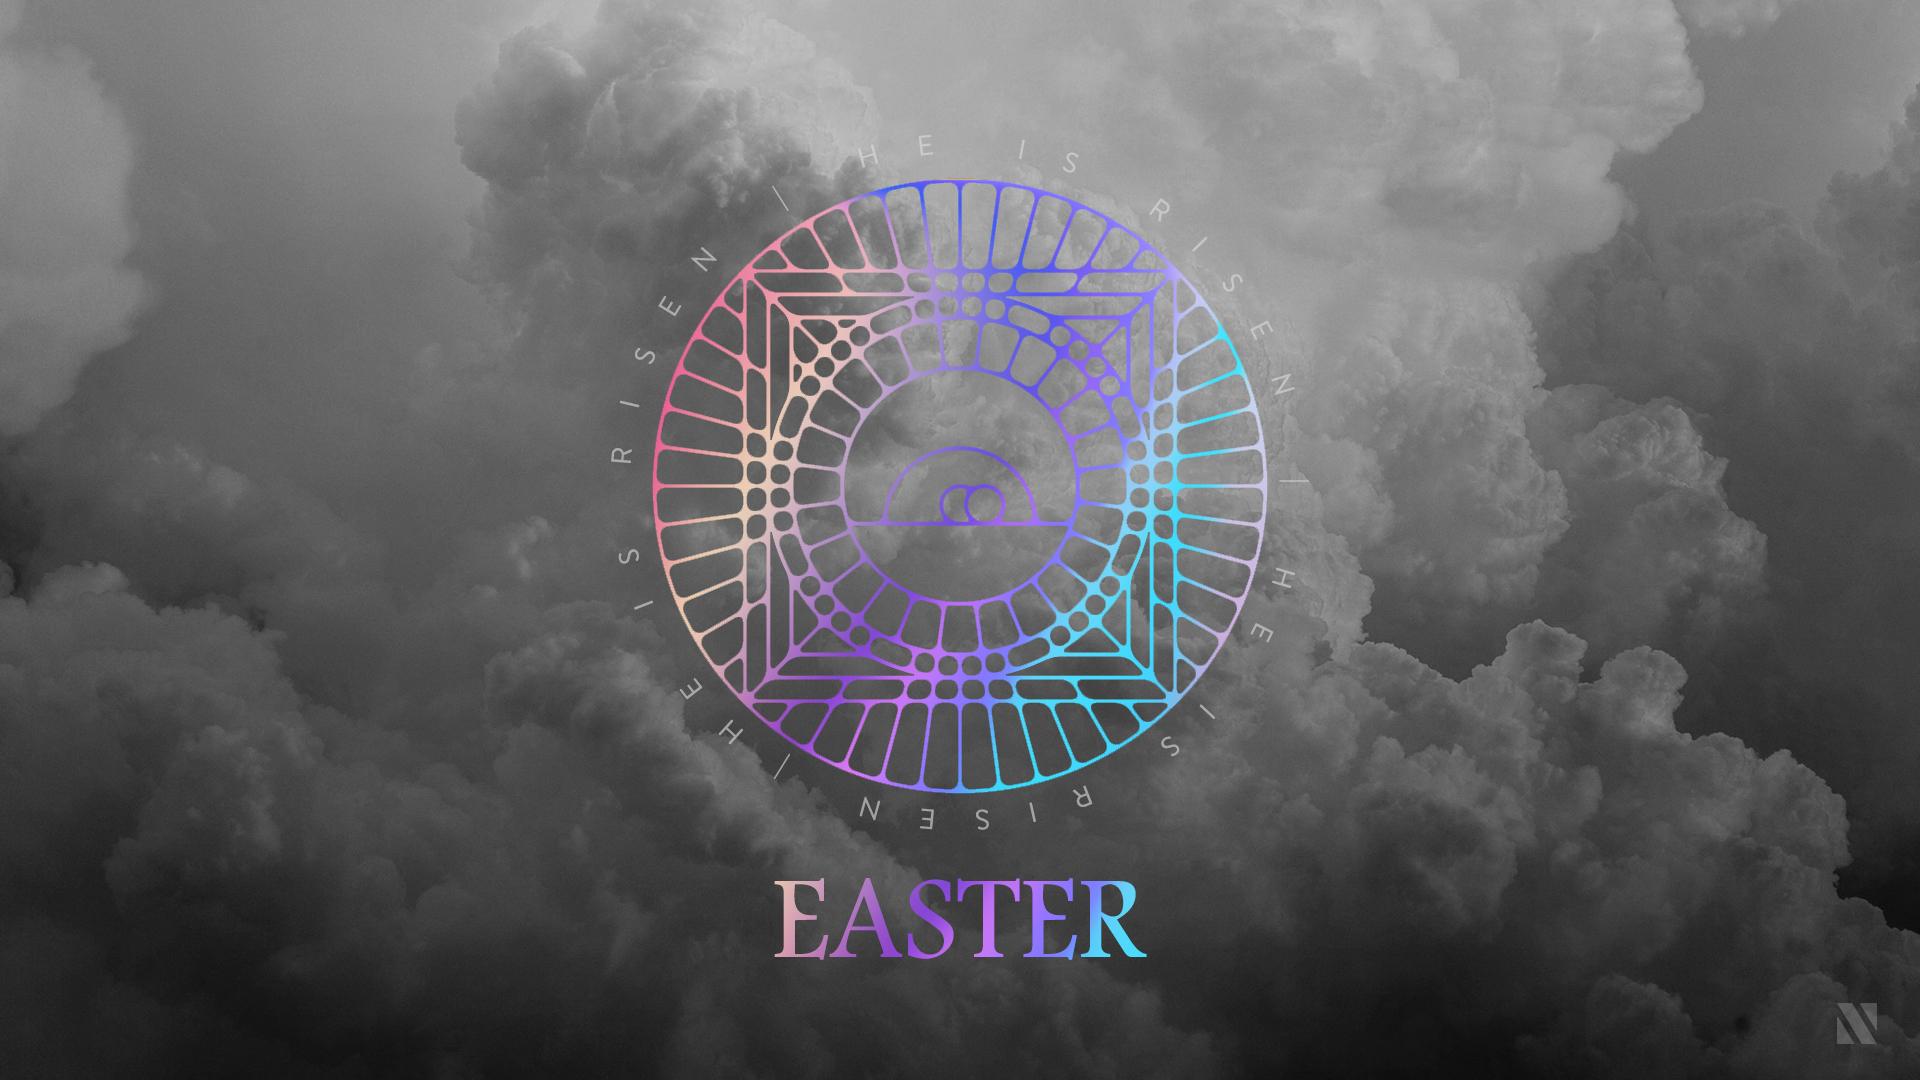 EasterNew2.jpg